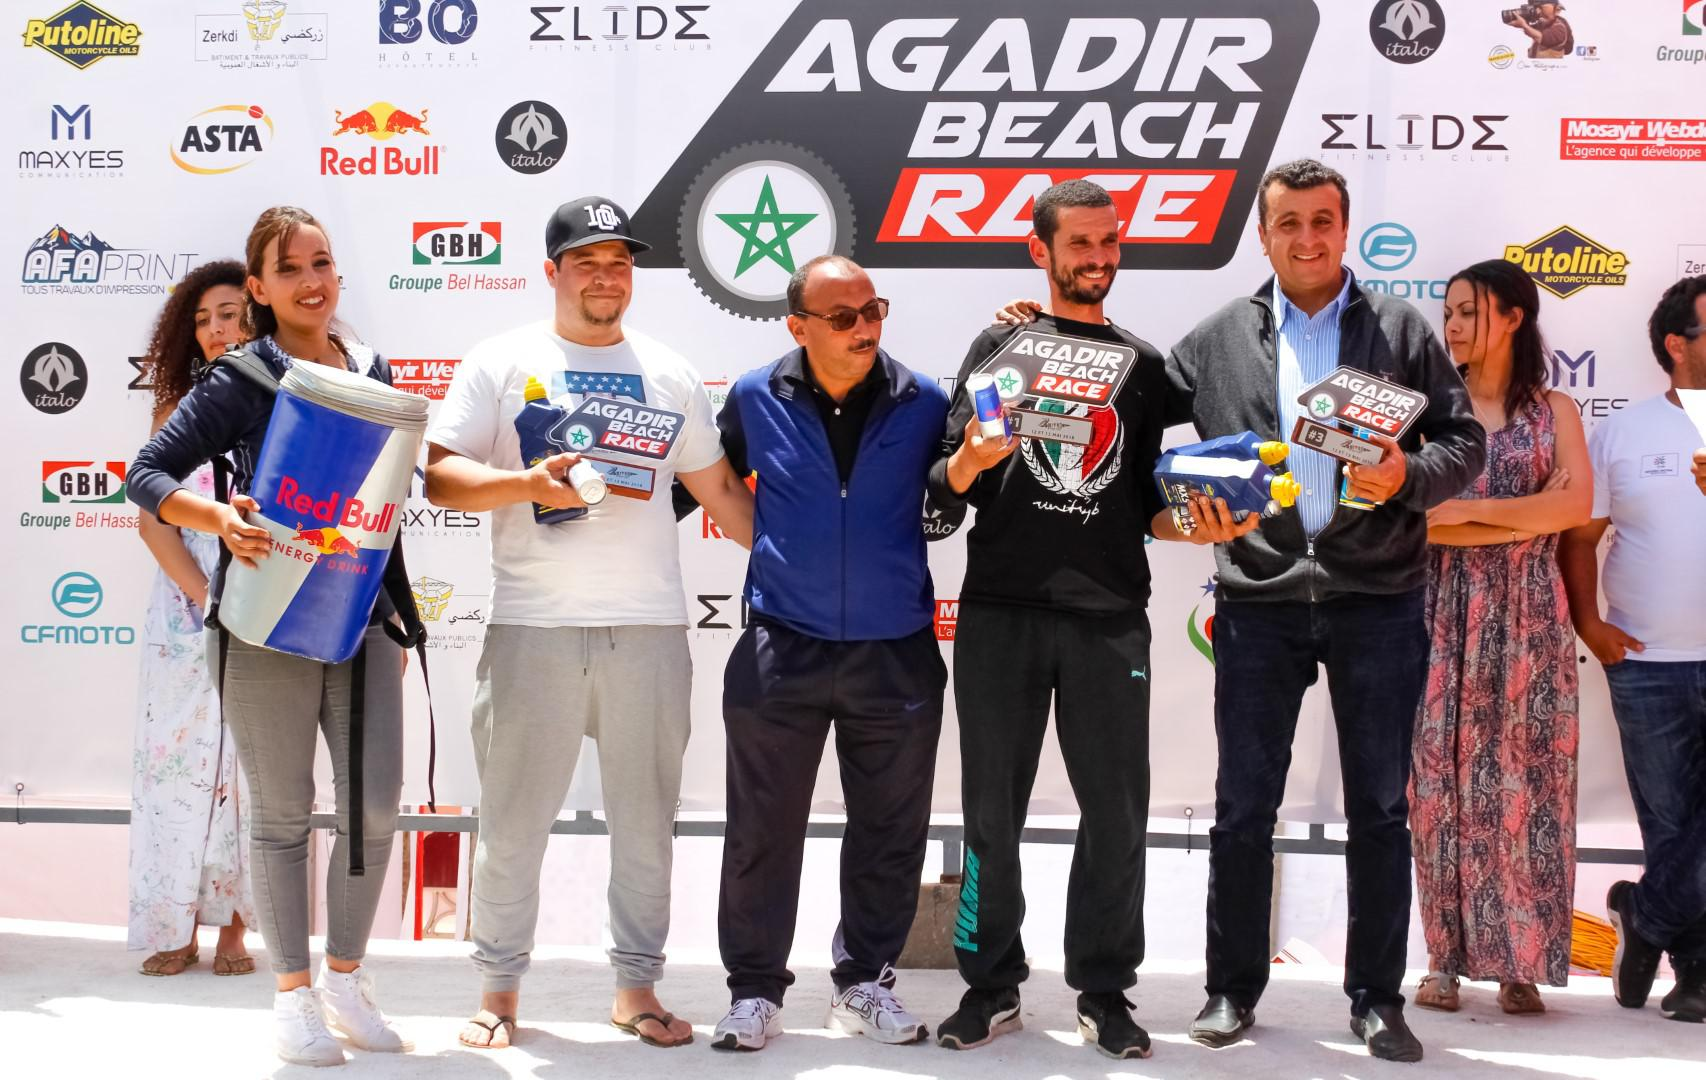 agadir-beach-race-la-reussite-791-10.jpg